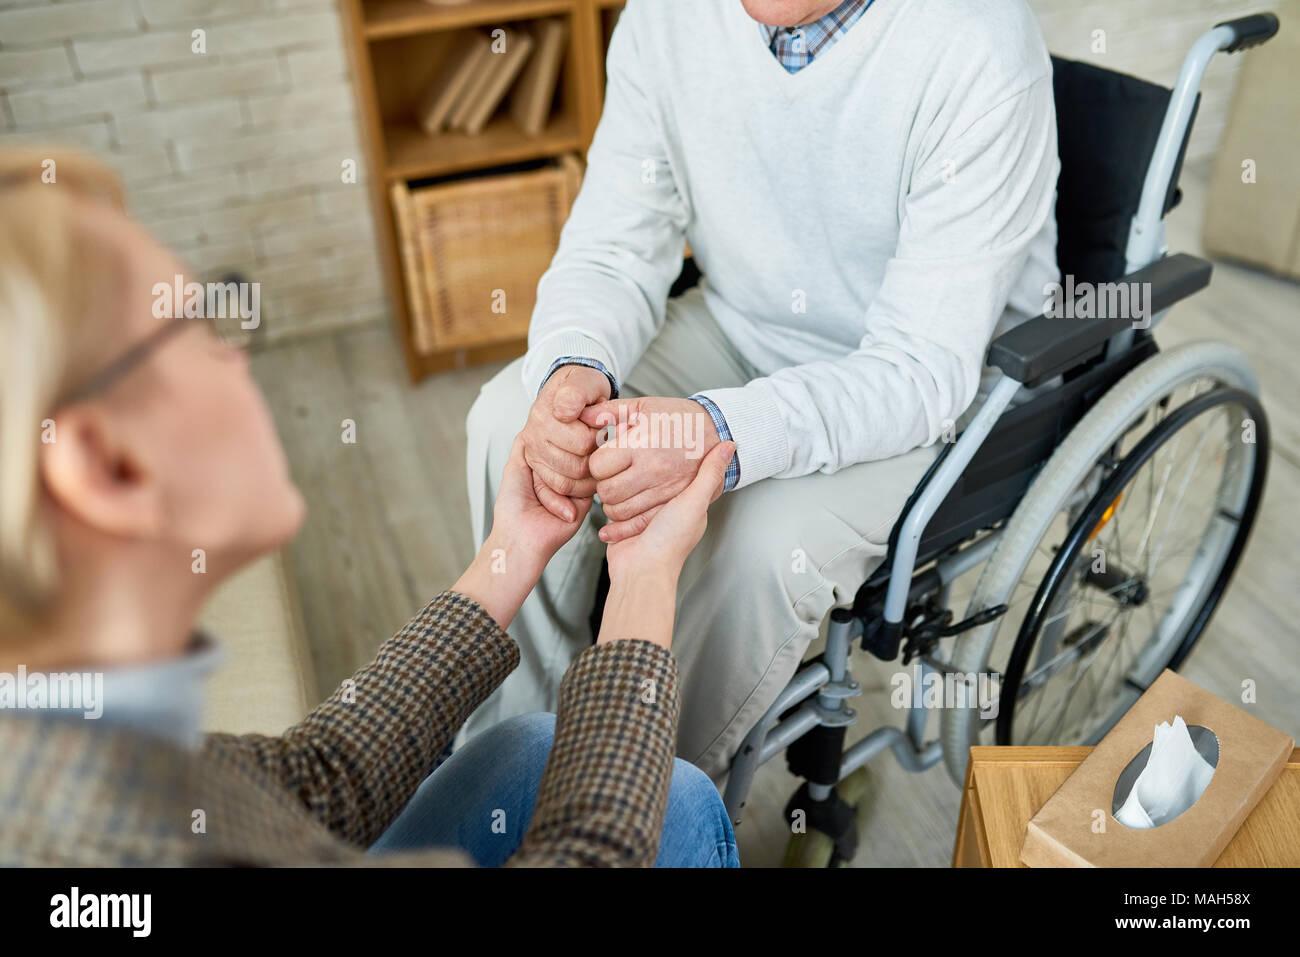 La empatía en la terapia Imagen De Stock